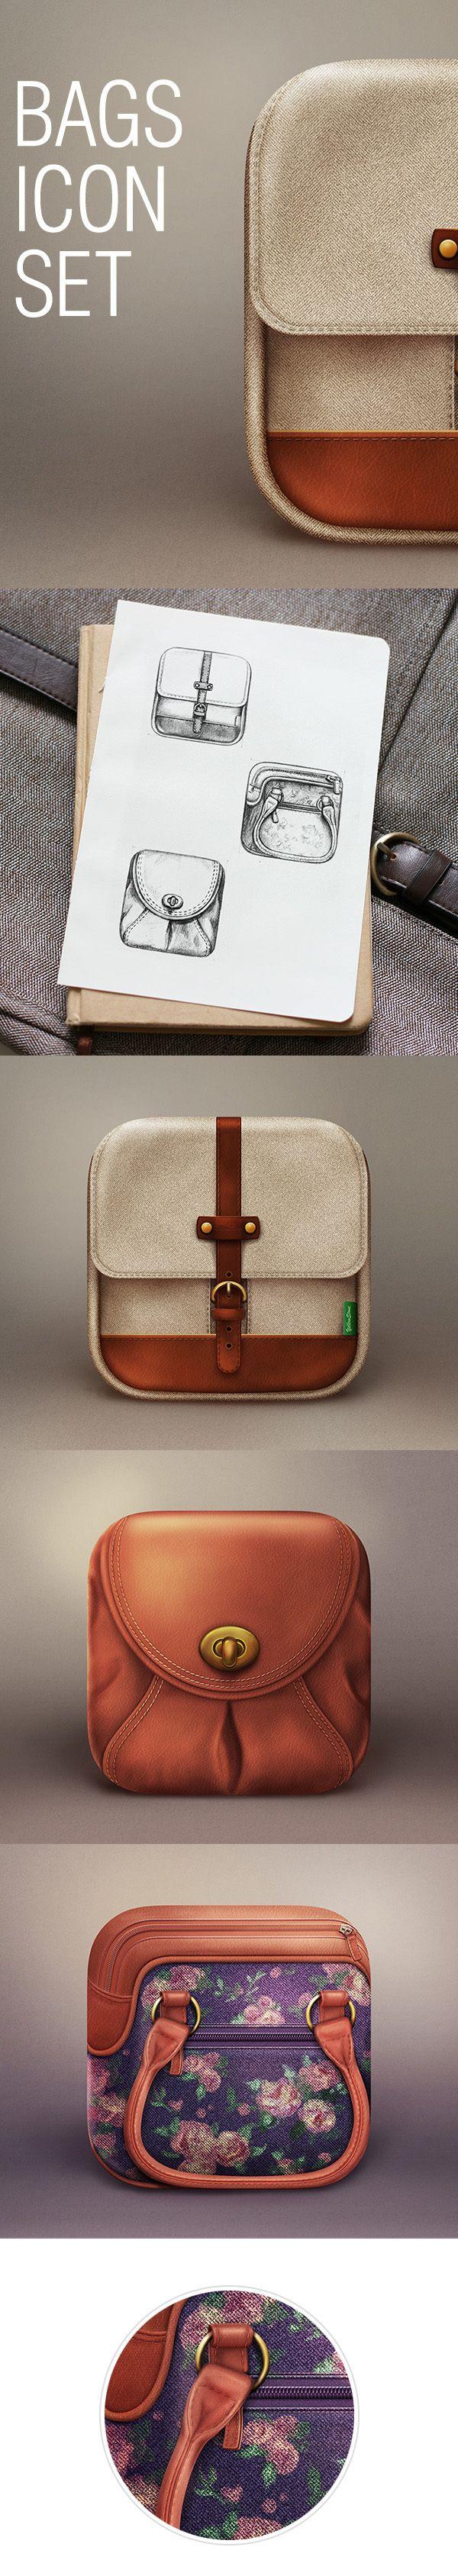 Bags icon set on Beh...